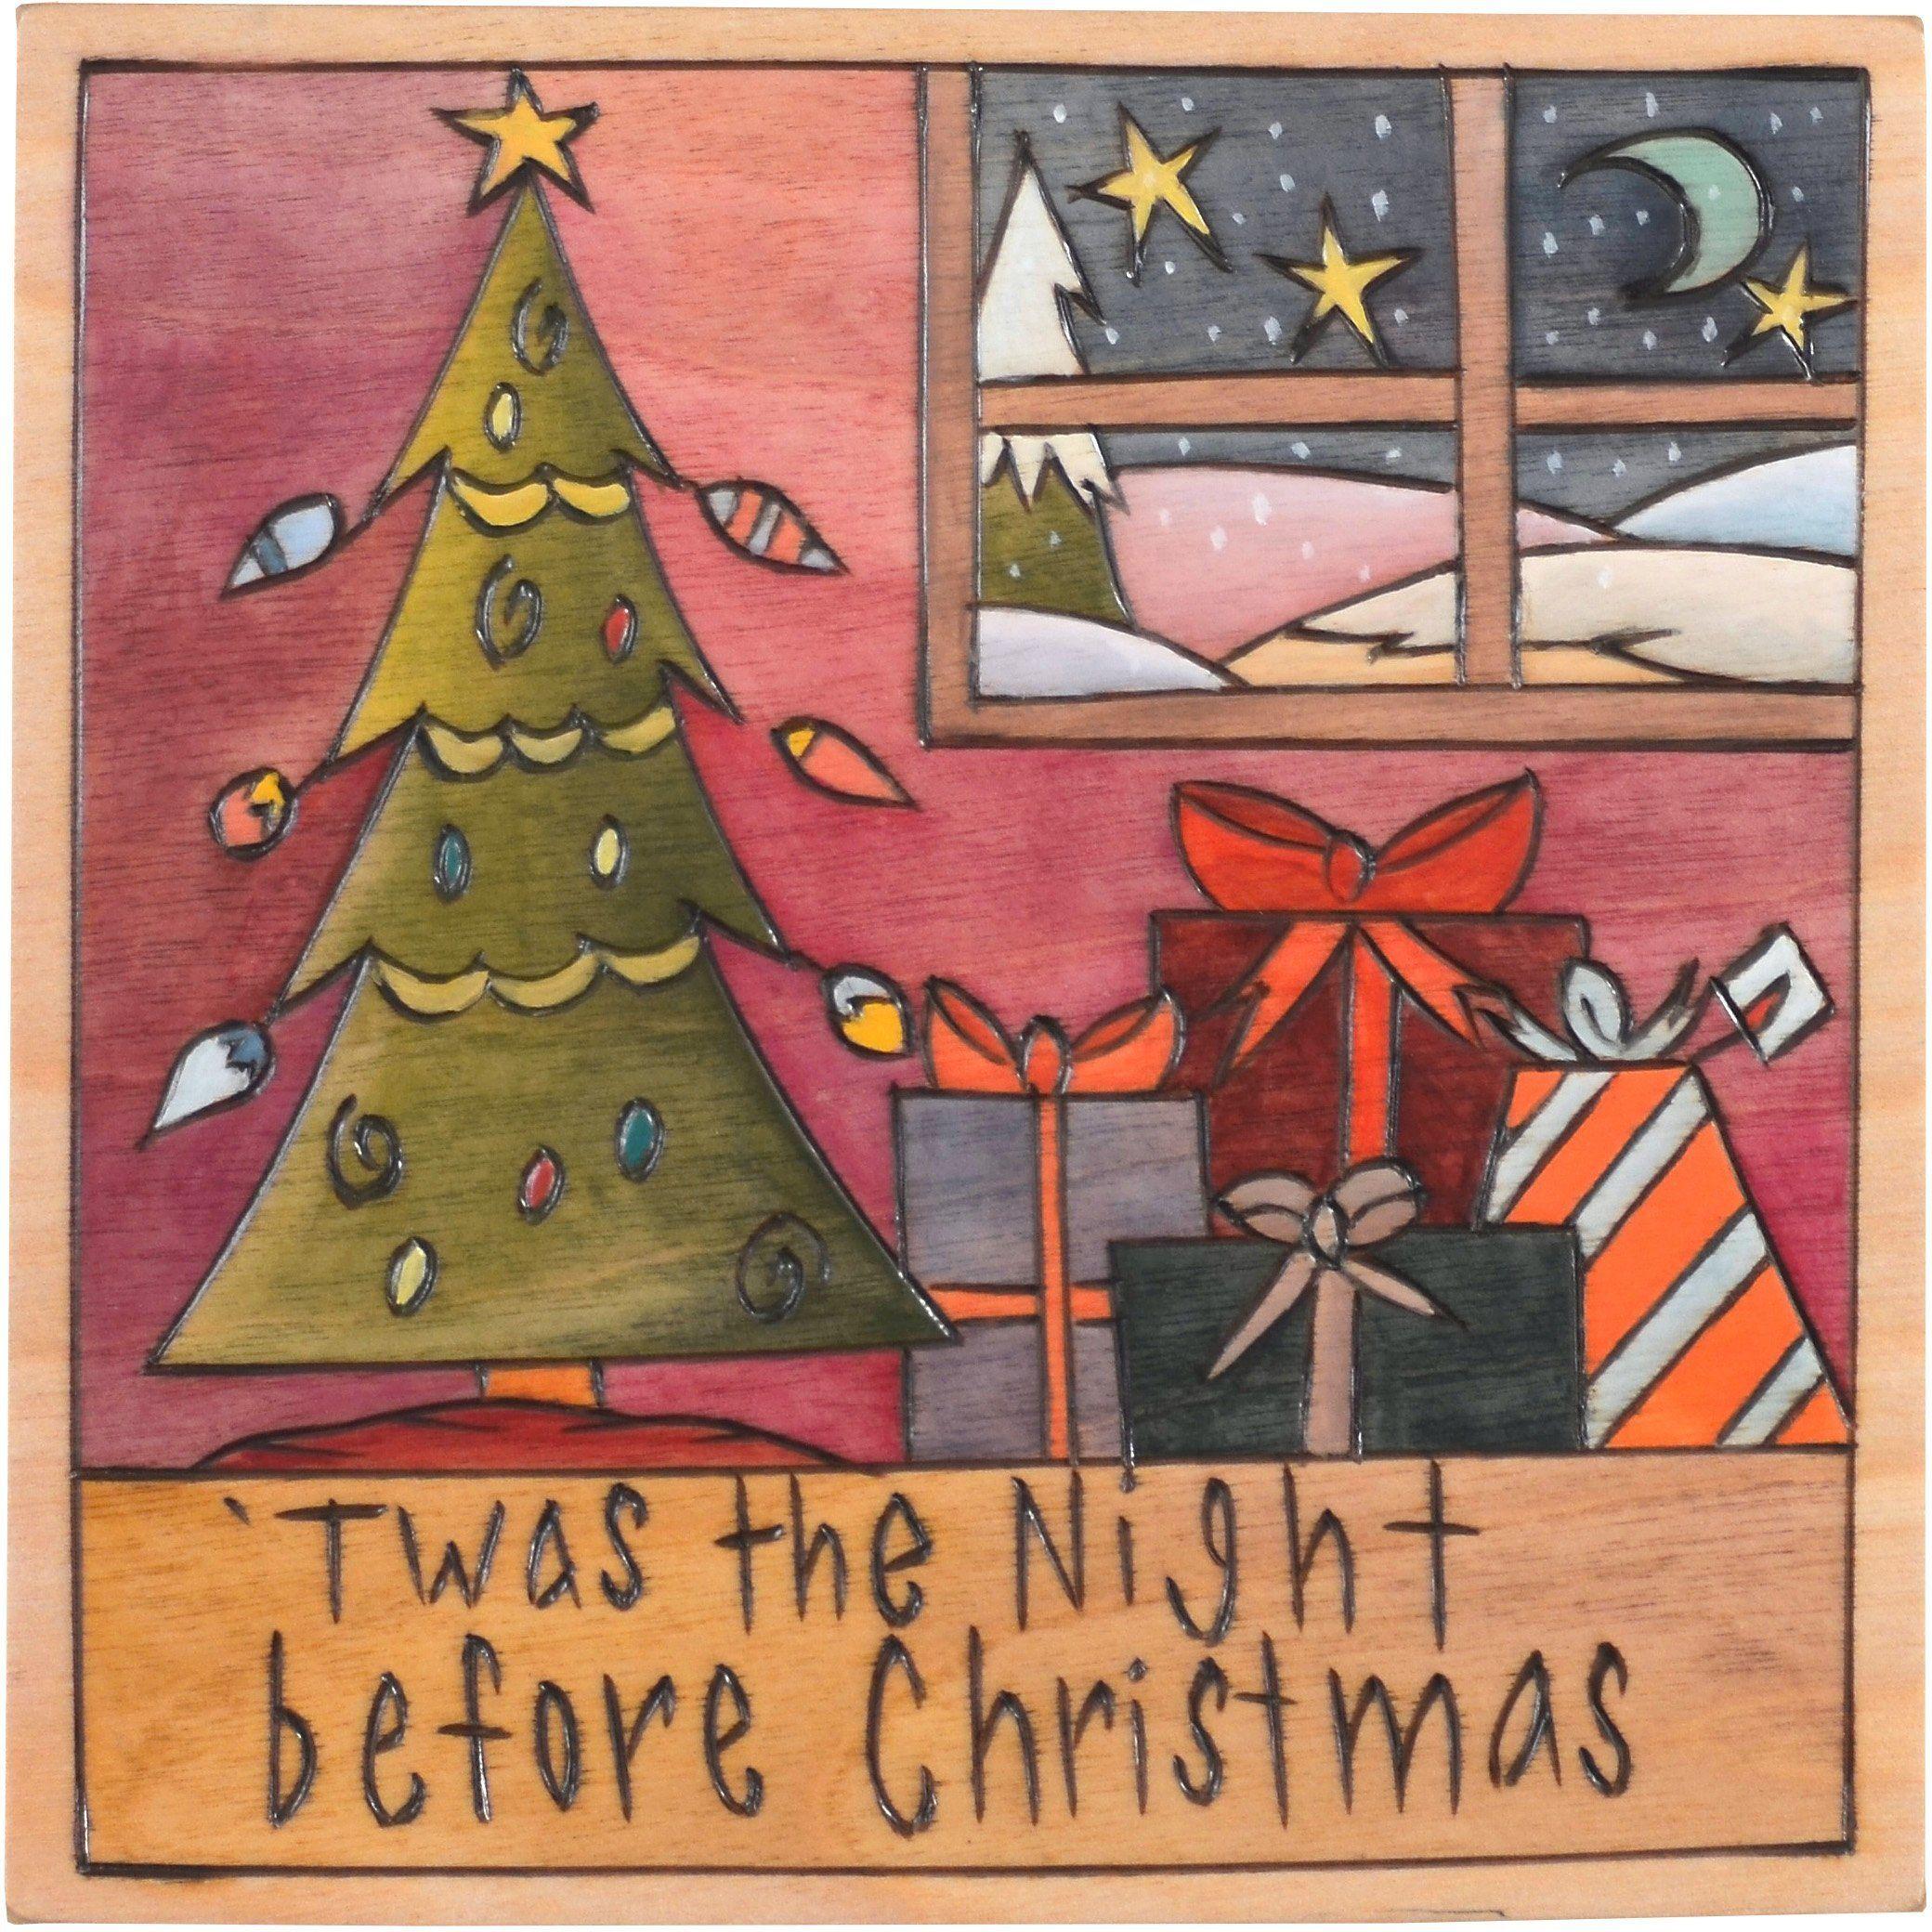 7 X7 Plaque Plaques Pinterest Christmas Christmas Art And